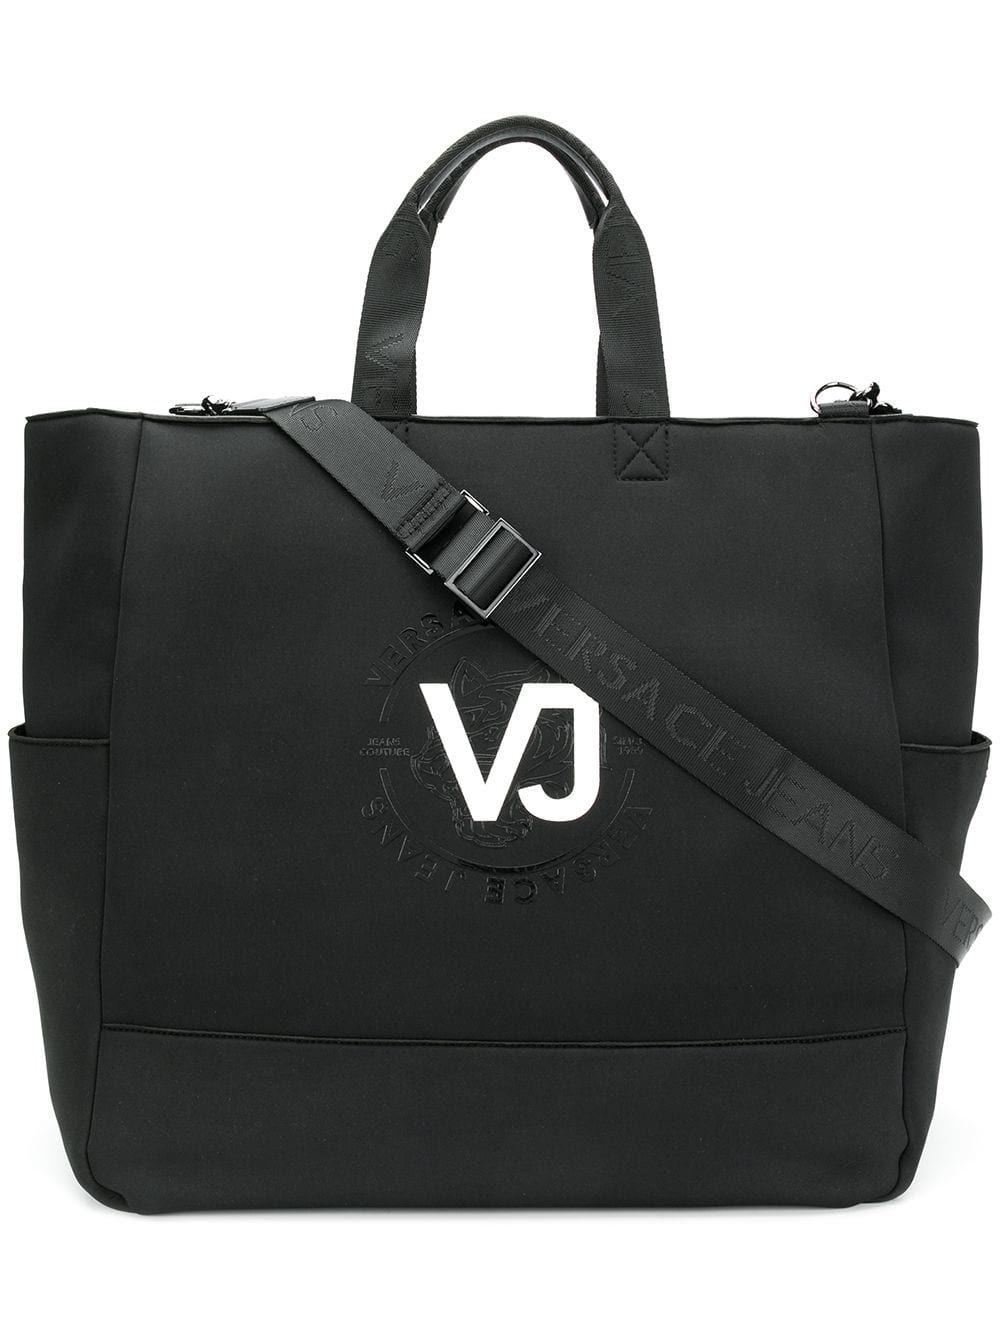 VERSACE JEANS VERSACE JEANS LOGO PRINT TOTE - BLACK.  versacejeans  bags  shoulder  bags  hand bags  denim  tote  lining ad1eb7074b353